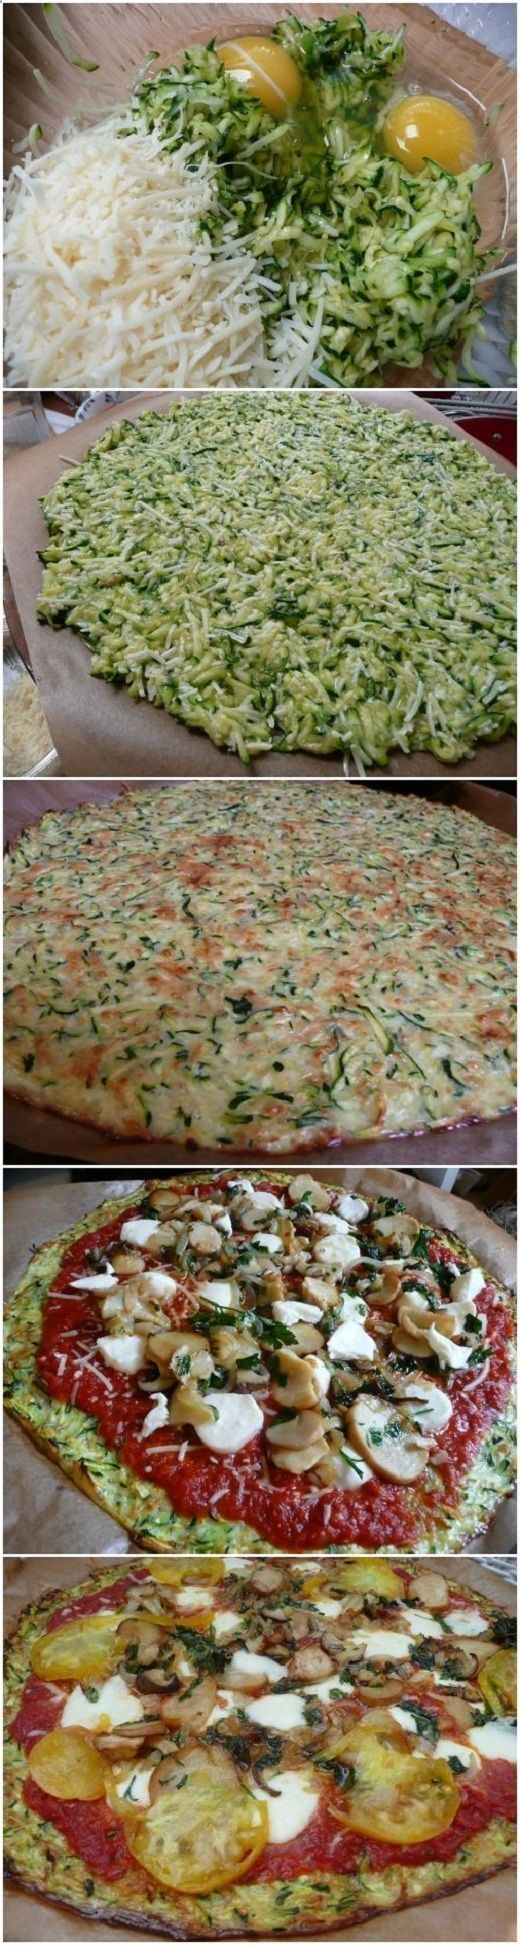 Zucchini Crust Pizza.. WOW favorite new healthy recipe!!